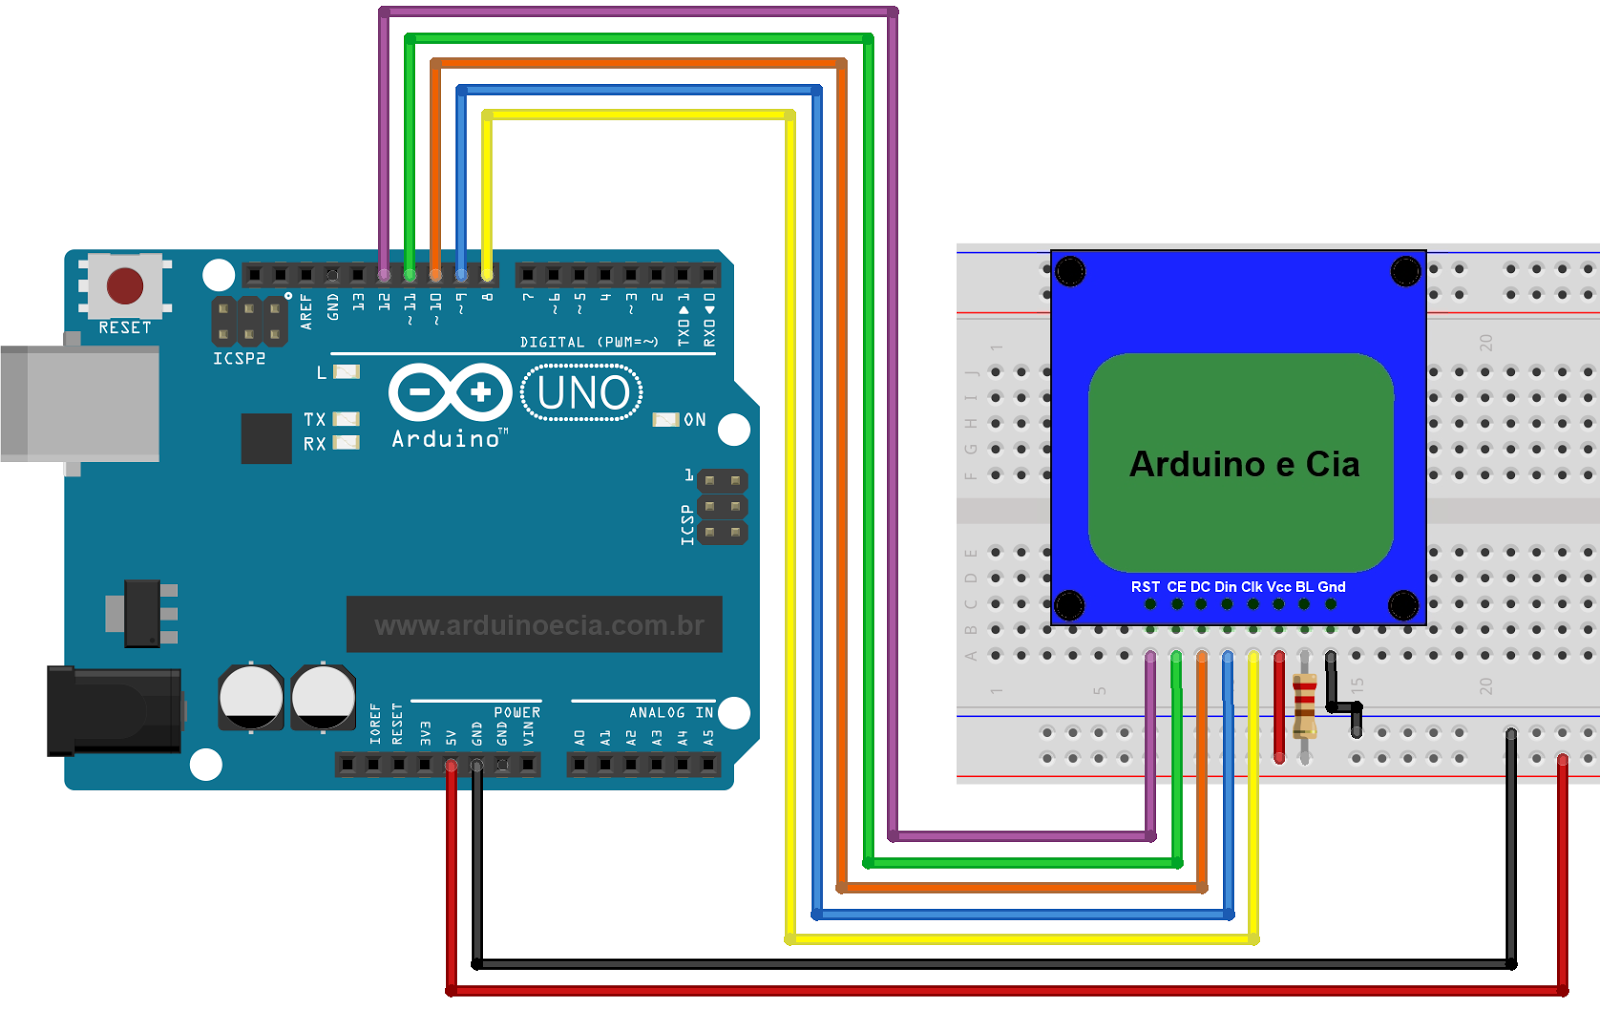 Display Lcd Nokia 5110 Arduino Pinterest And Smokesensor Circuit Combined With Zigbee Wsn Development Board Circuito E Projects Programming Hardware